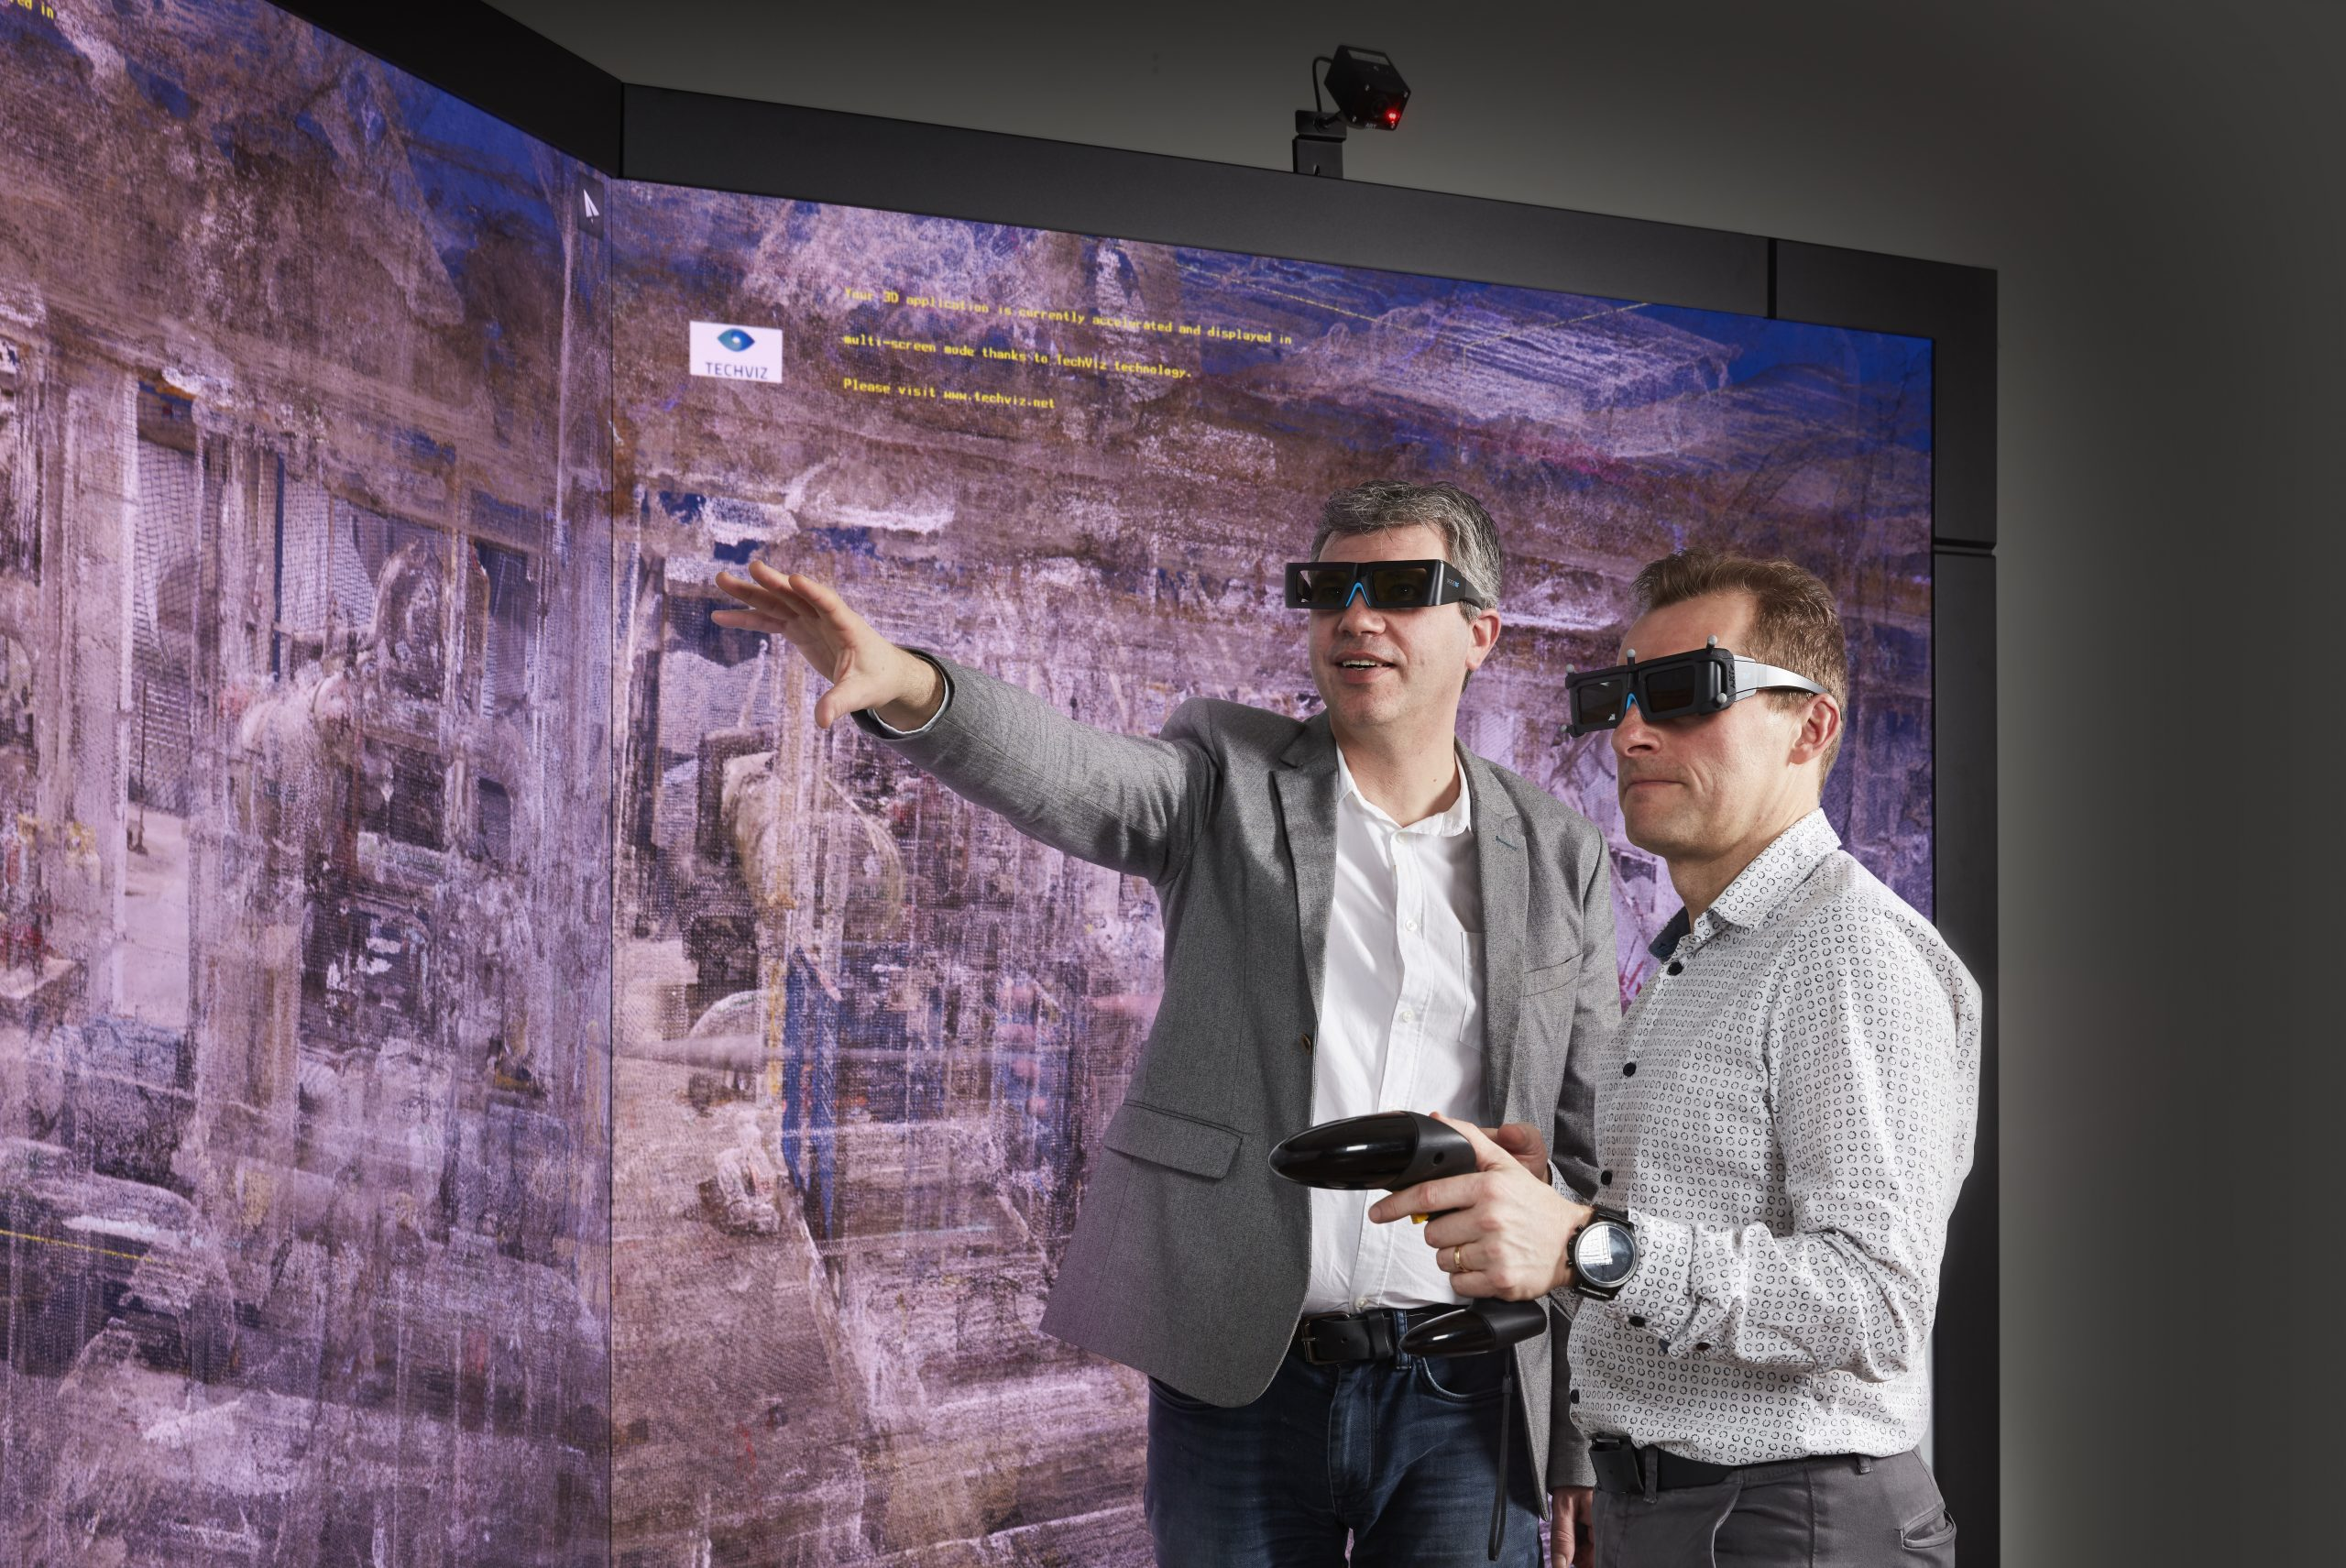 VR Collaboration: Working Together Using VR